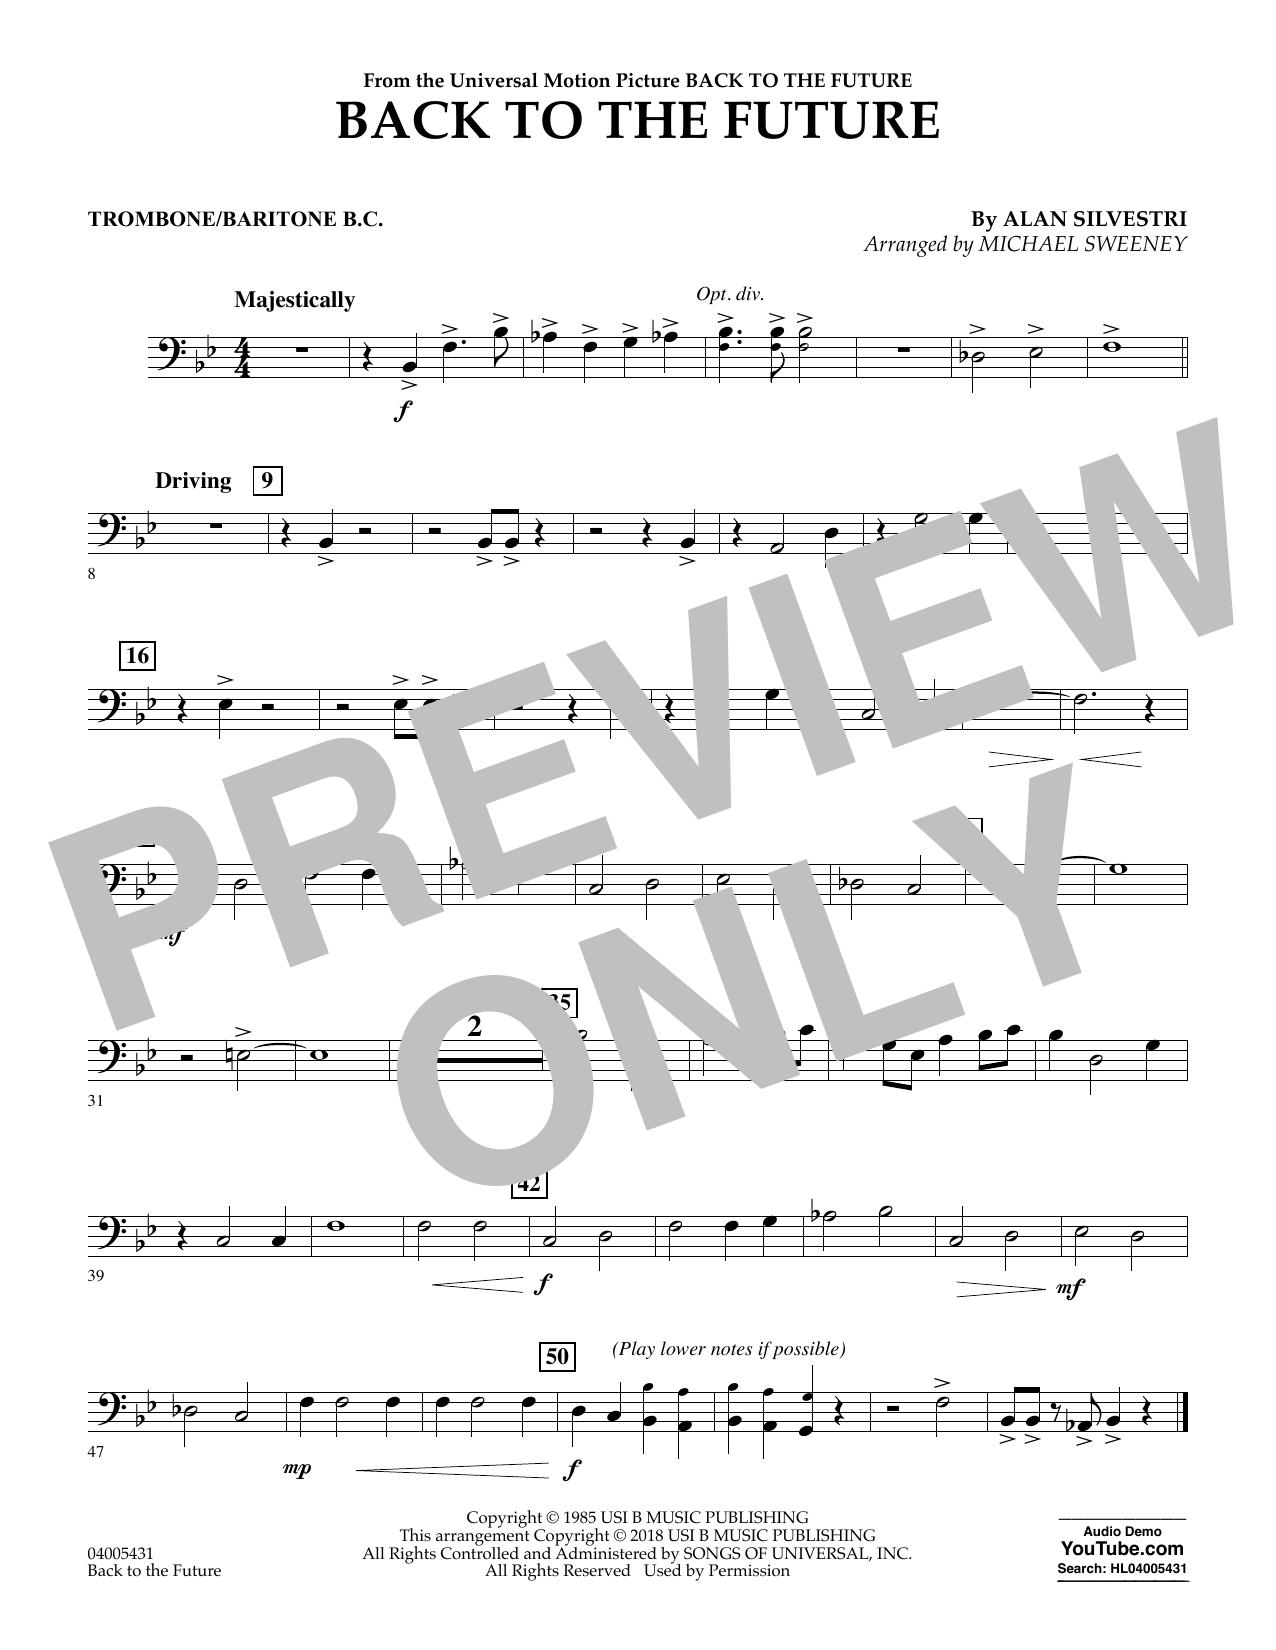 Back to the Future - Trombone/Baritone B.C. (Concert Band)